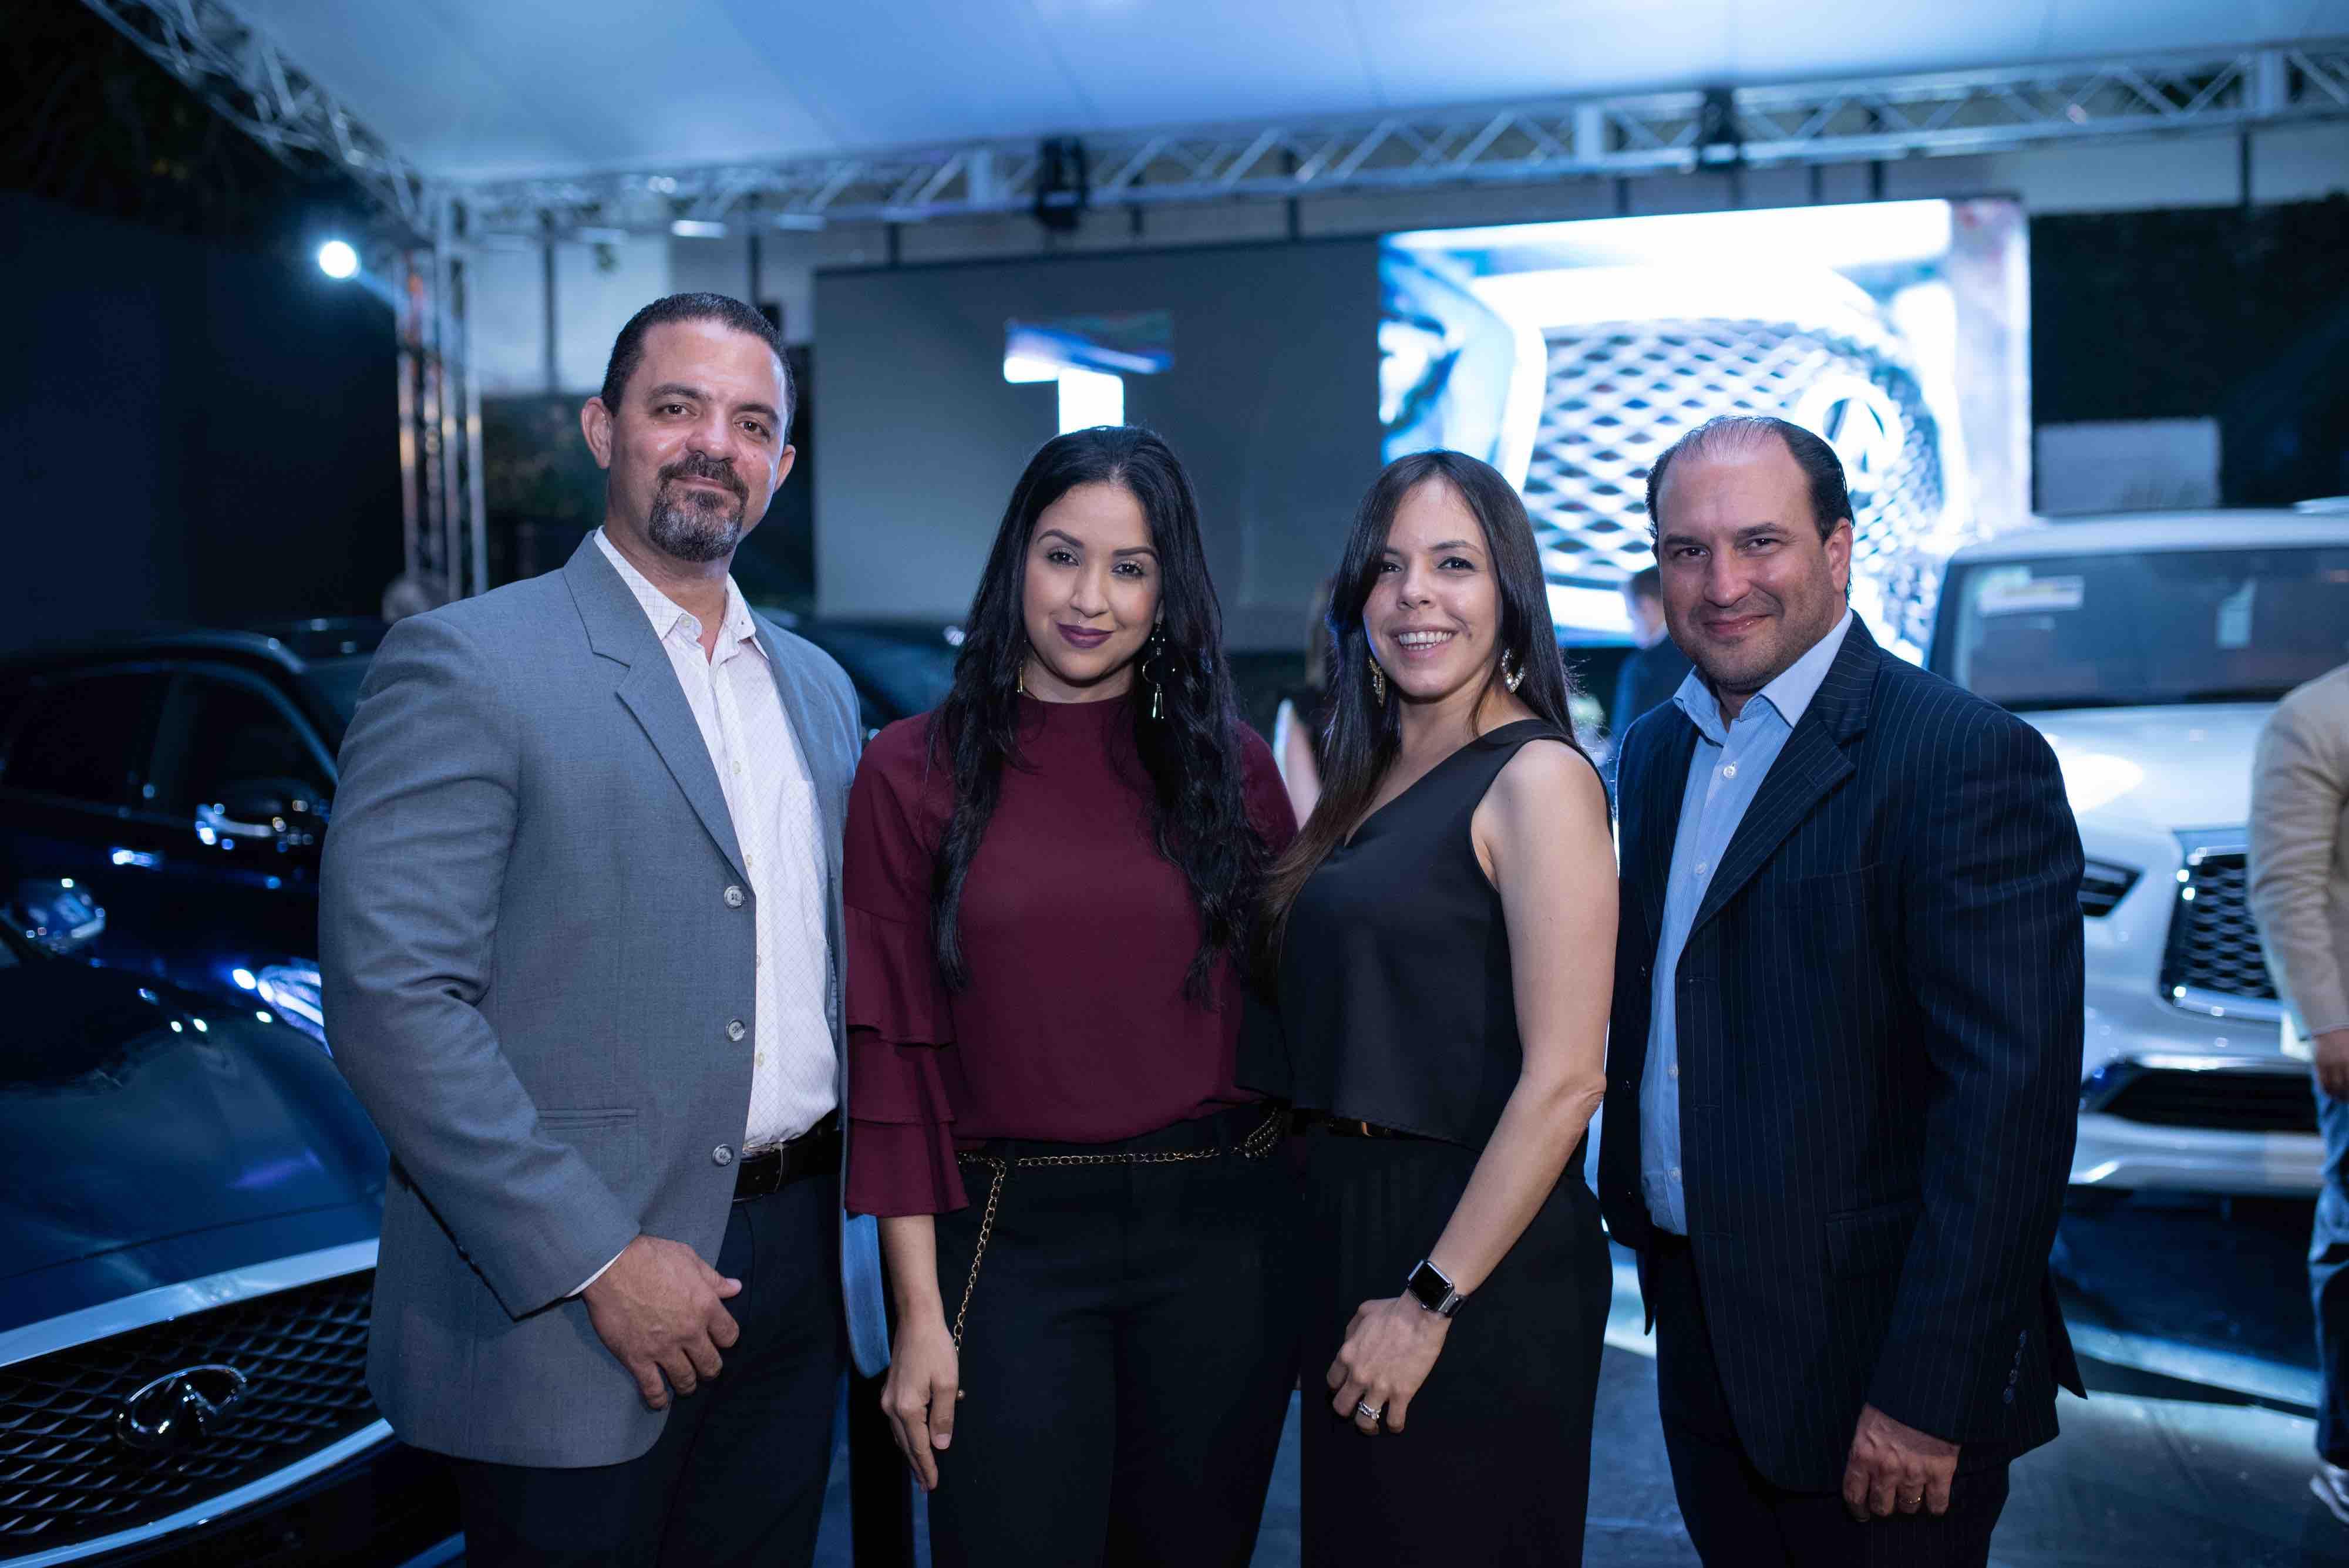 2. Pedro Nicasio, Liani Reyes, Melanie Portes y Juan Sierra